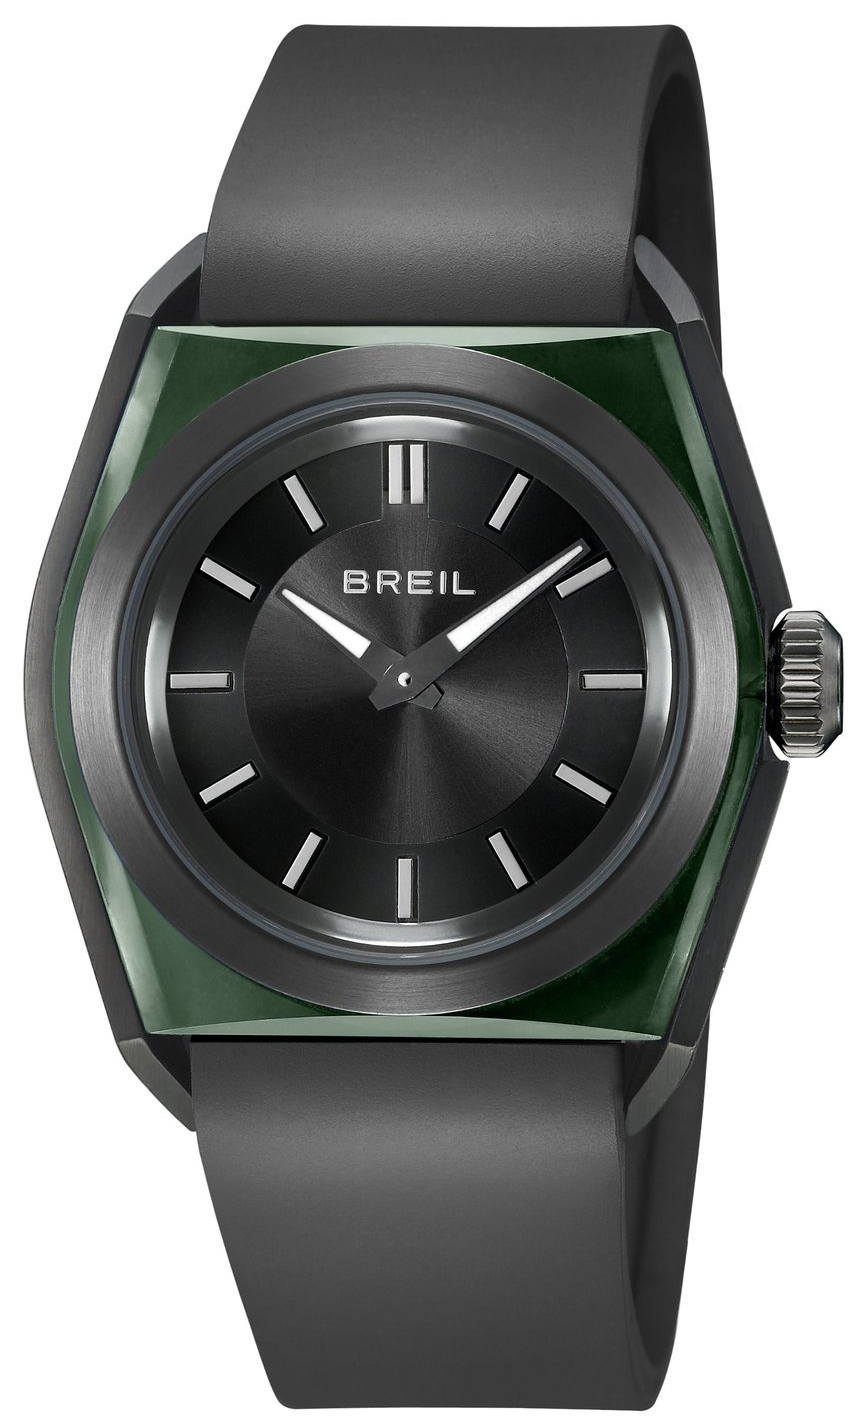 Breil Essence Herrklocka TW0981 Svart/Gummi - Breil